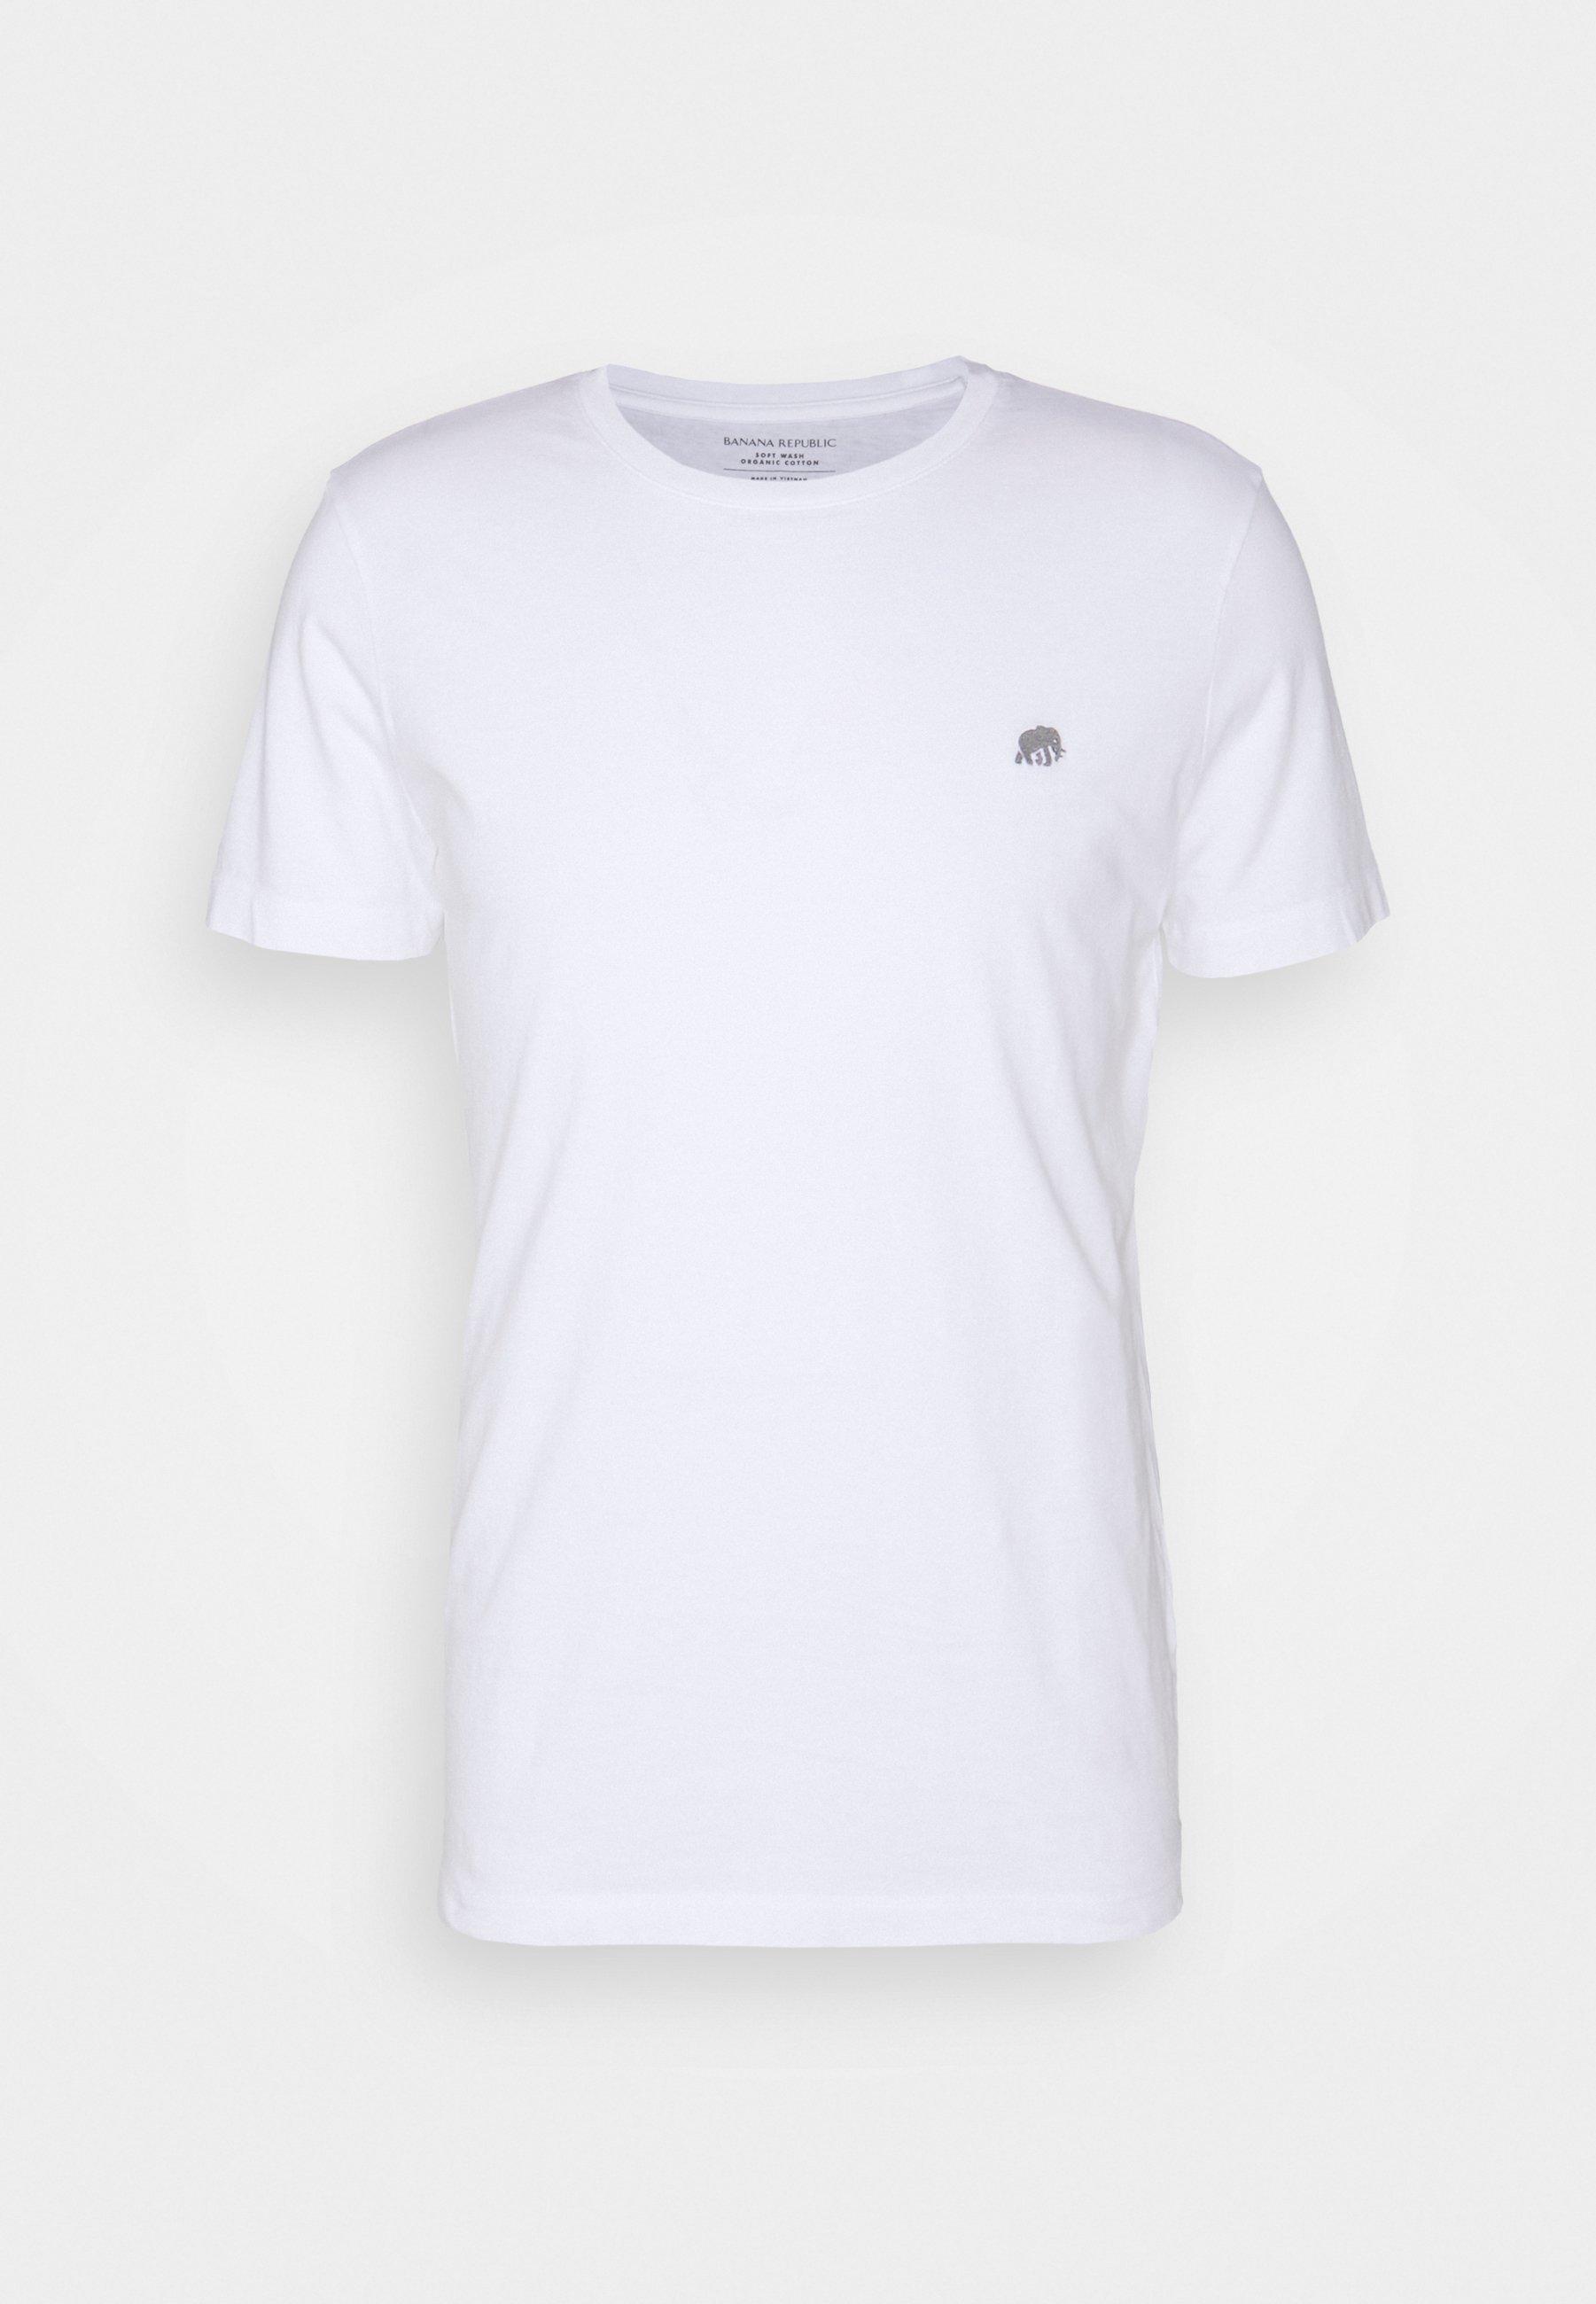 Homme LOGO SOFTWASH ORGANIC TEE - T-shirt basique